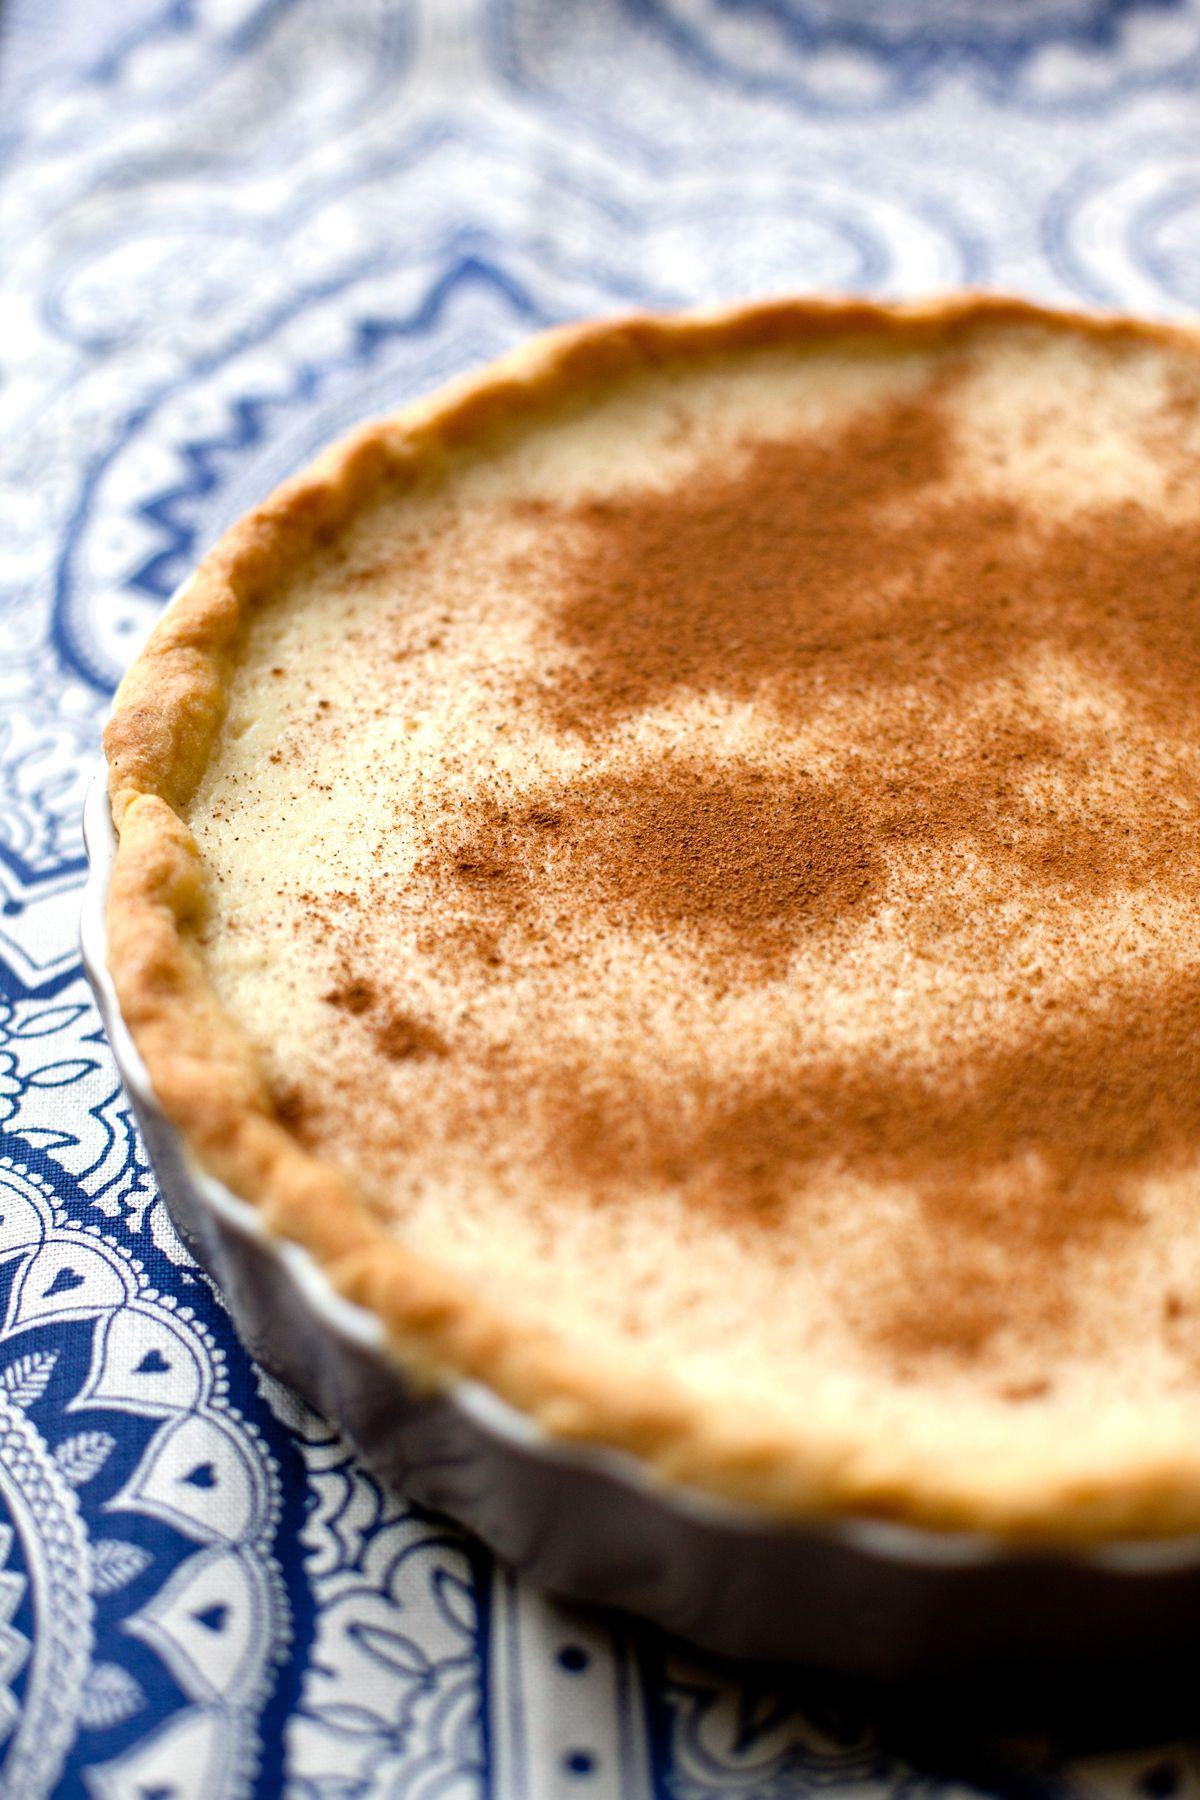 How To Make Milk Tart Easy Step By Step Milk Tart Recipe Just Easy Recipes Recipe Milk Tart Tart Recipes Milktart Recipe